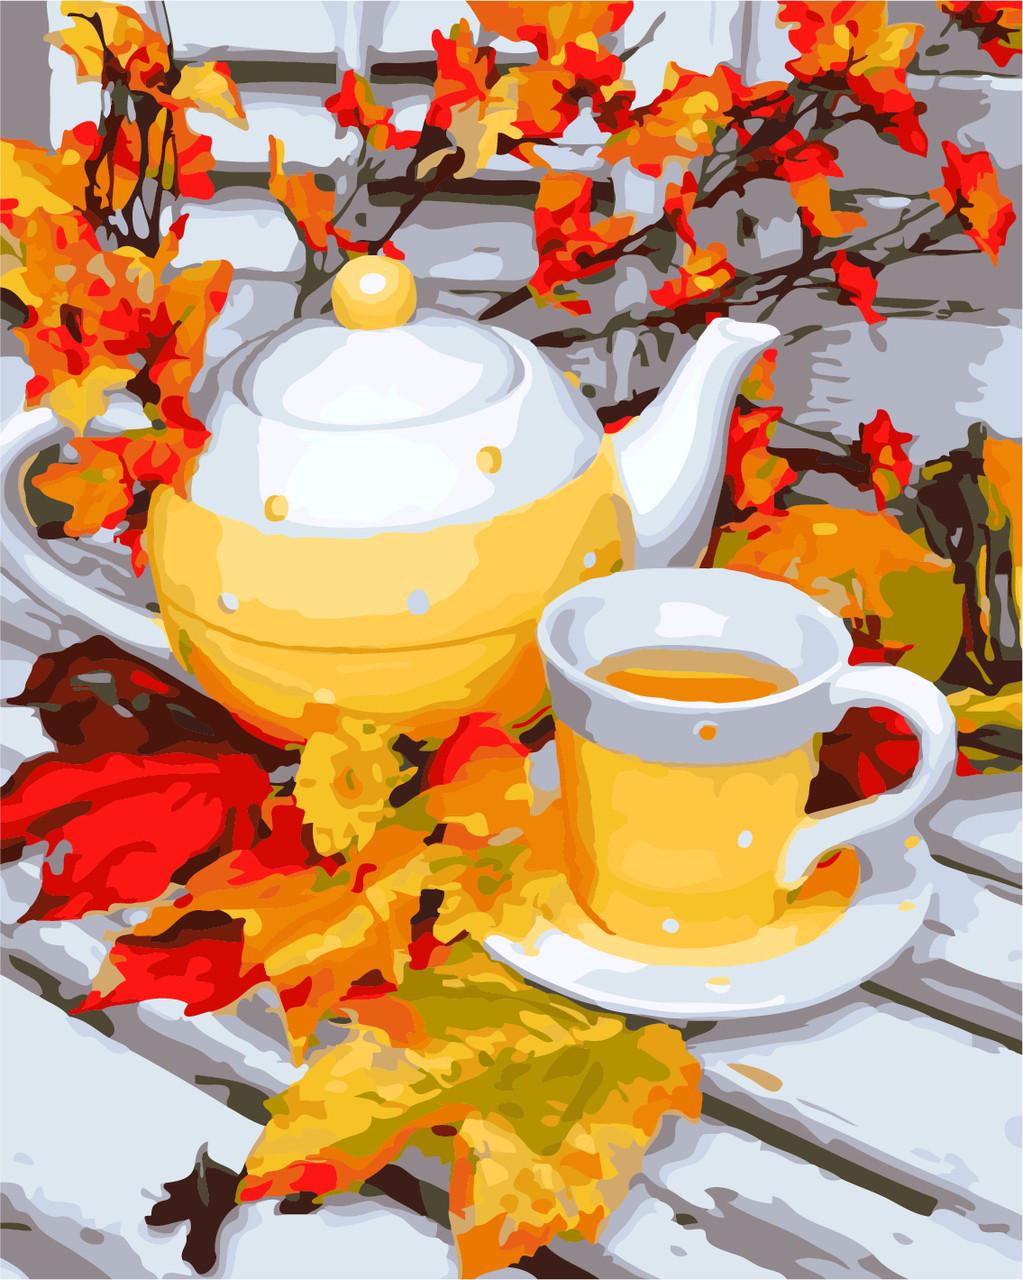 Картина по номерам Осенний день, 40x50 см., Art Story